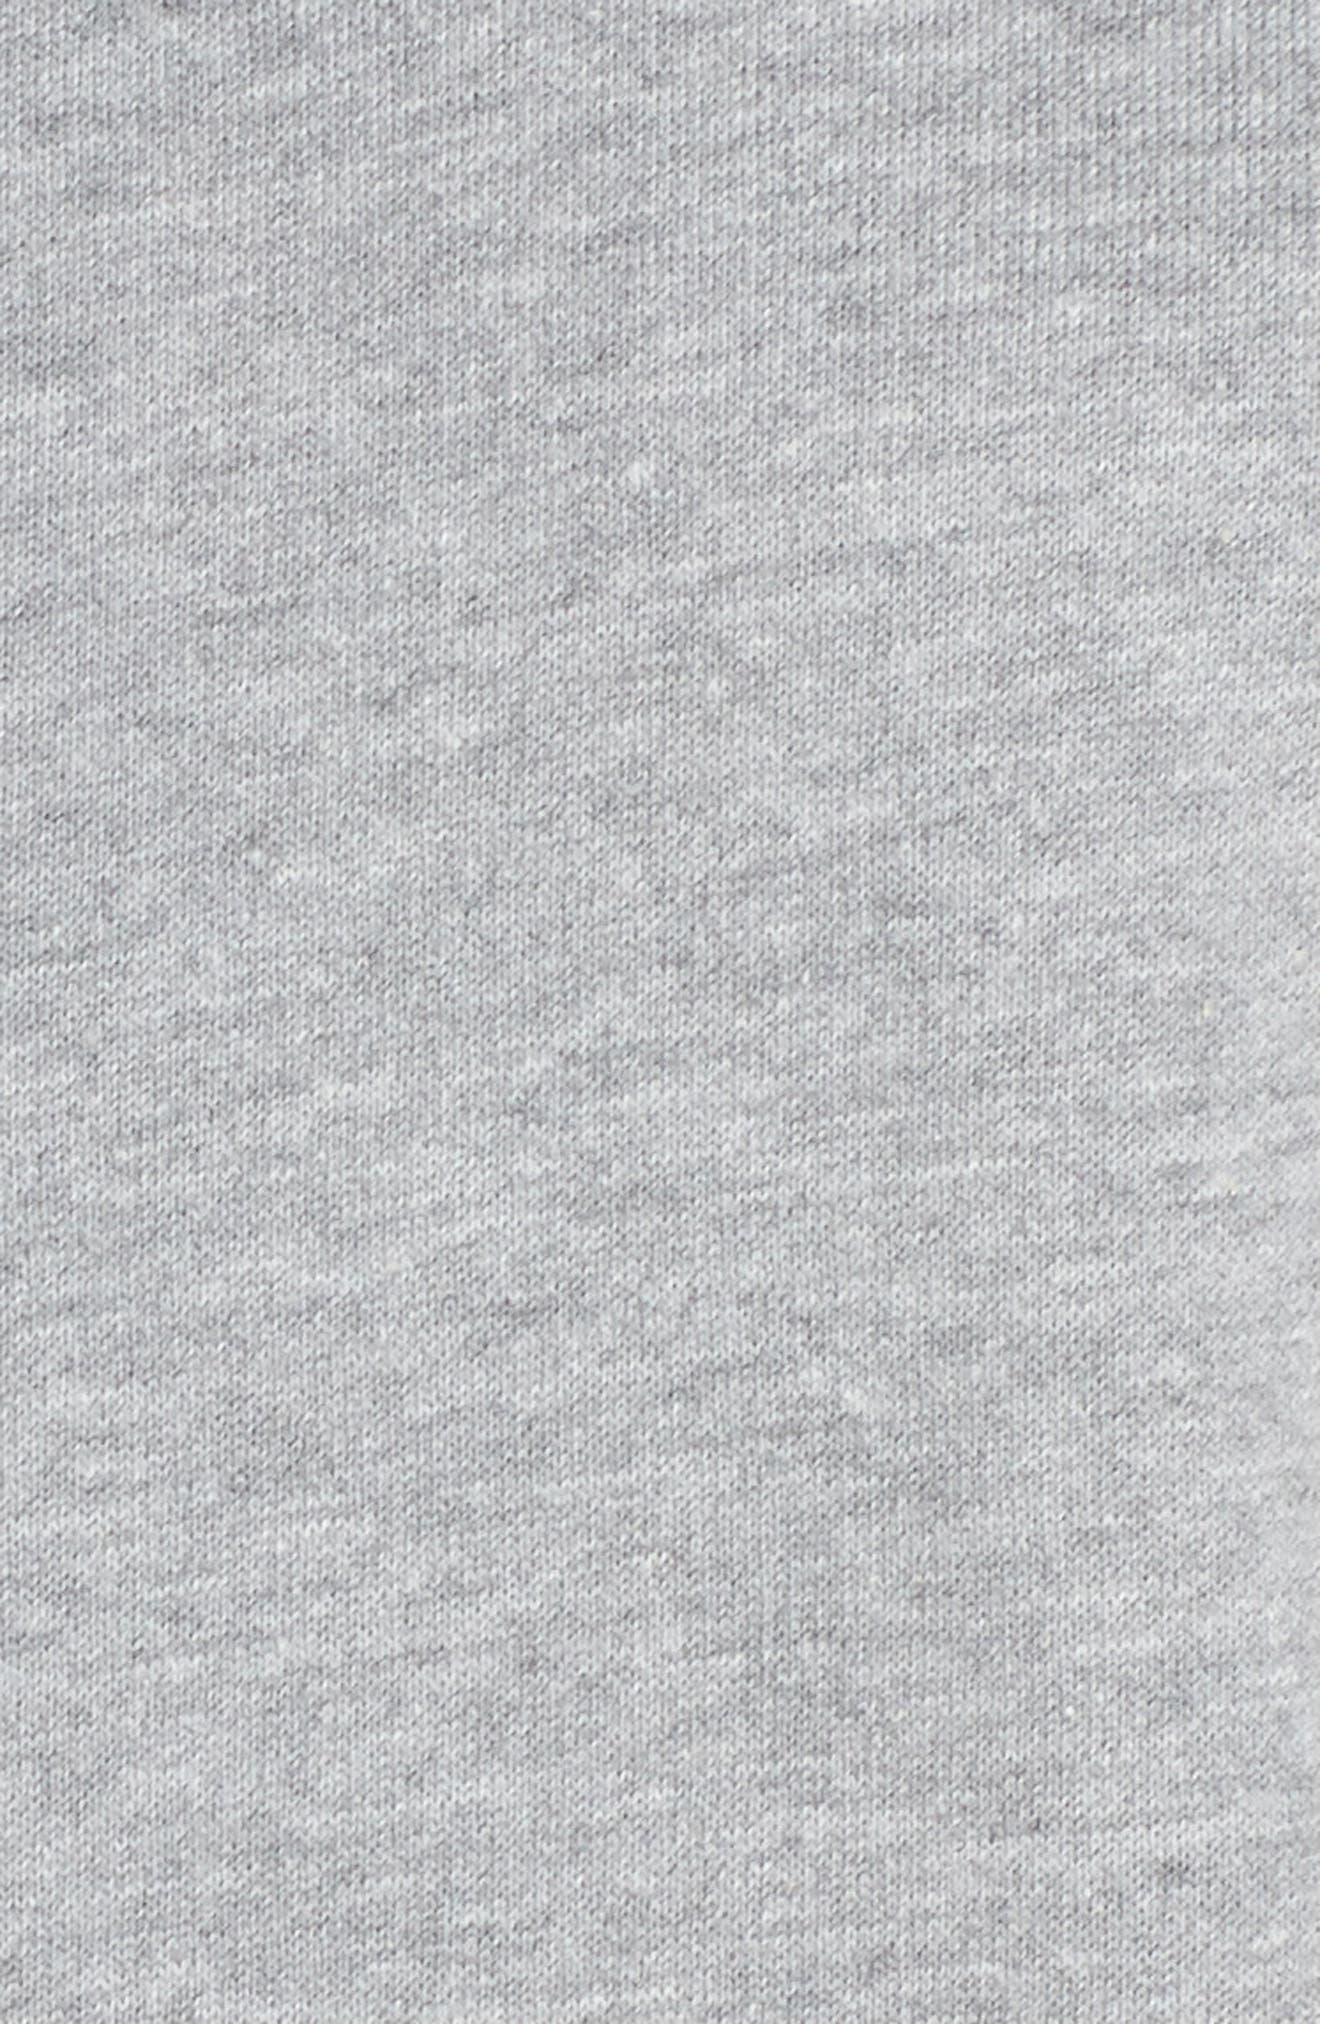 TOMMY HILFIGER,                             Crop Lounge Sweatshirt,                             Alternate thumbnail 5, color,                             025